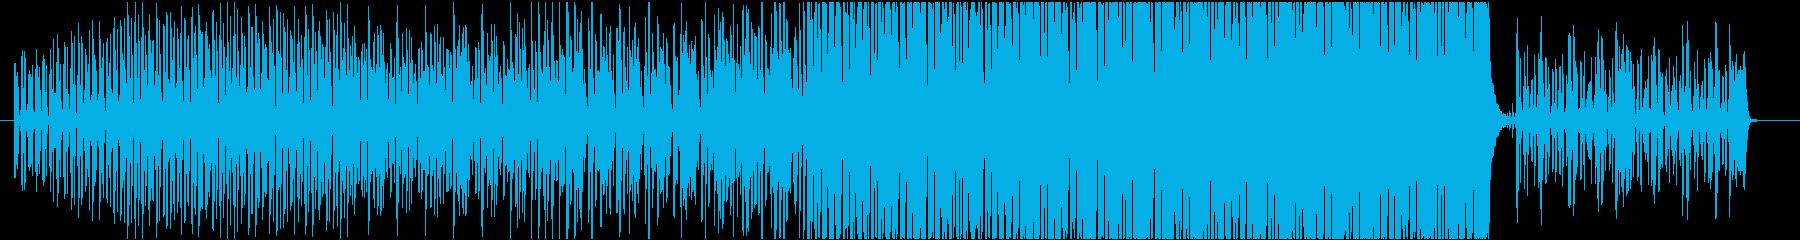 EDM 軽快なエレクトロスウィングの再生済みの波形